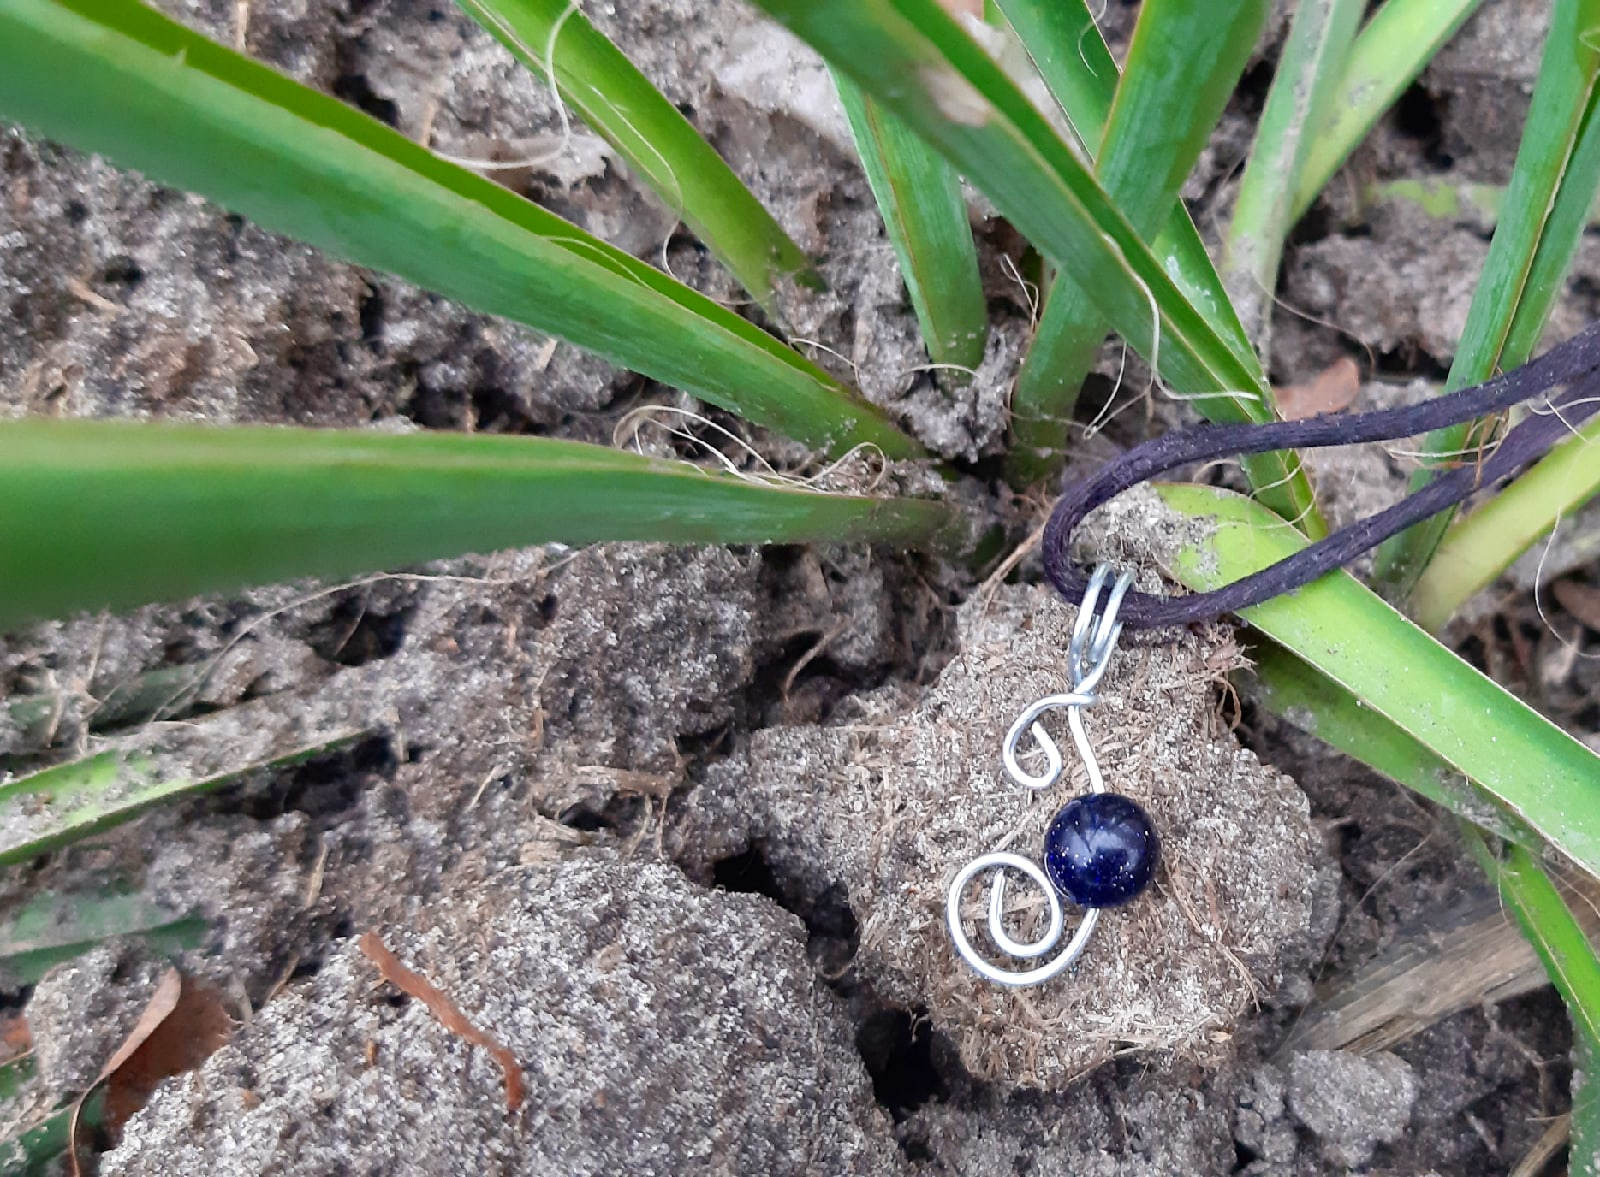 Украина - Натуальные камни. Талисманы, амулеты из натуральных камней - Страница 3 HCf5BBDIJFM